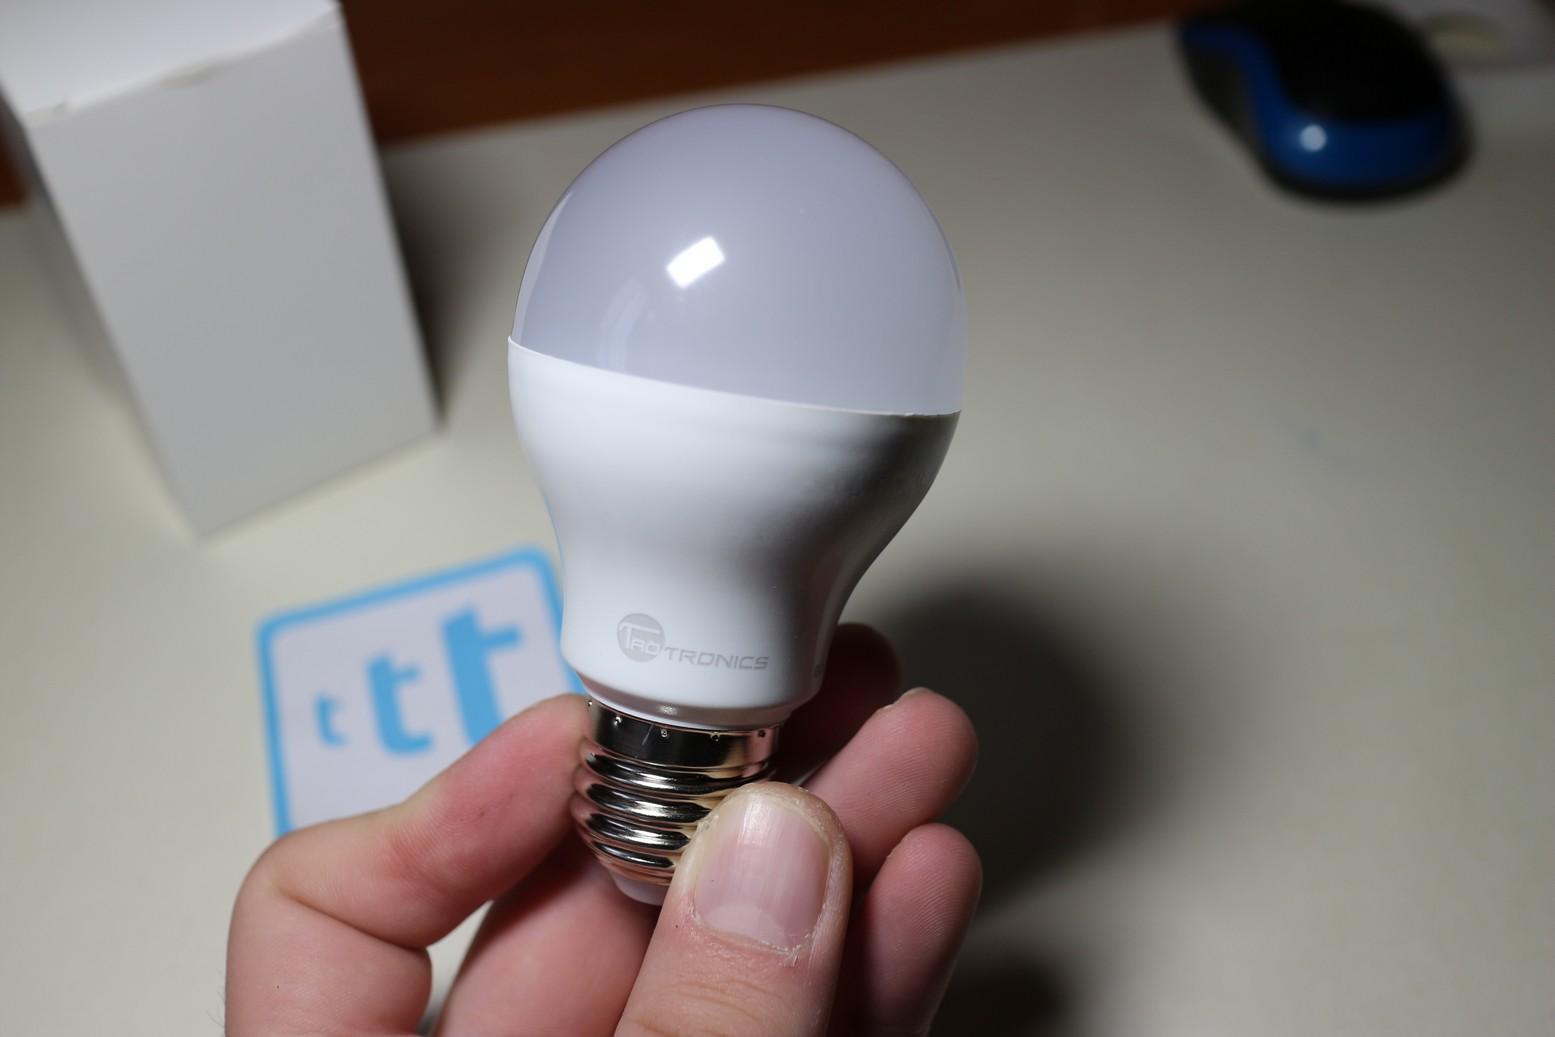 Taotronics set lampadine al led la nostra recensione